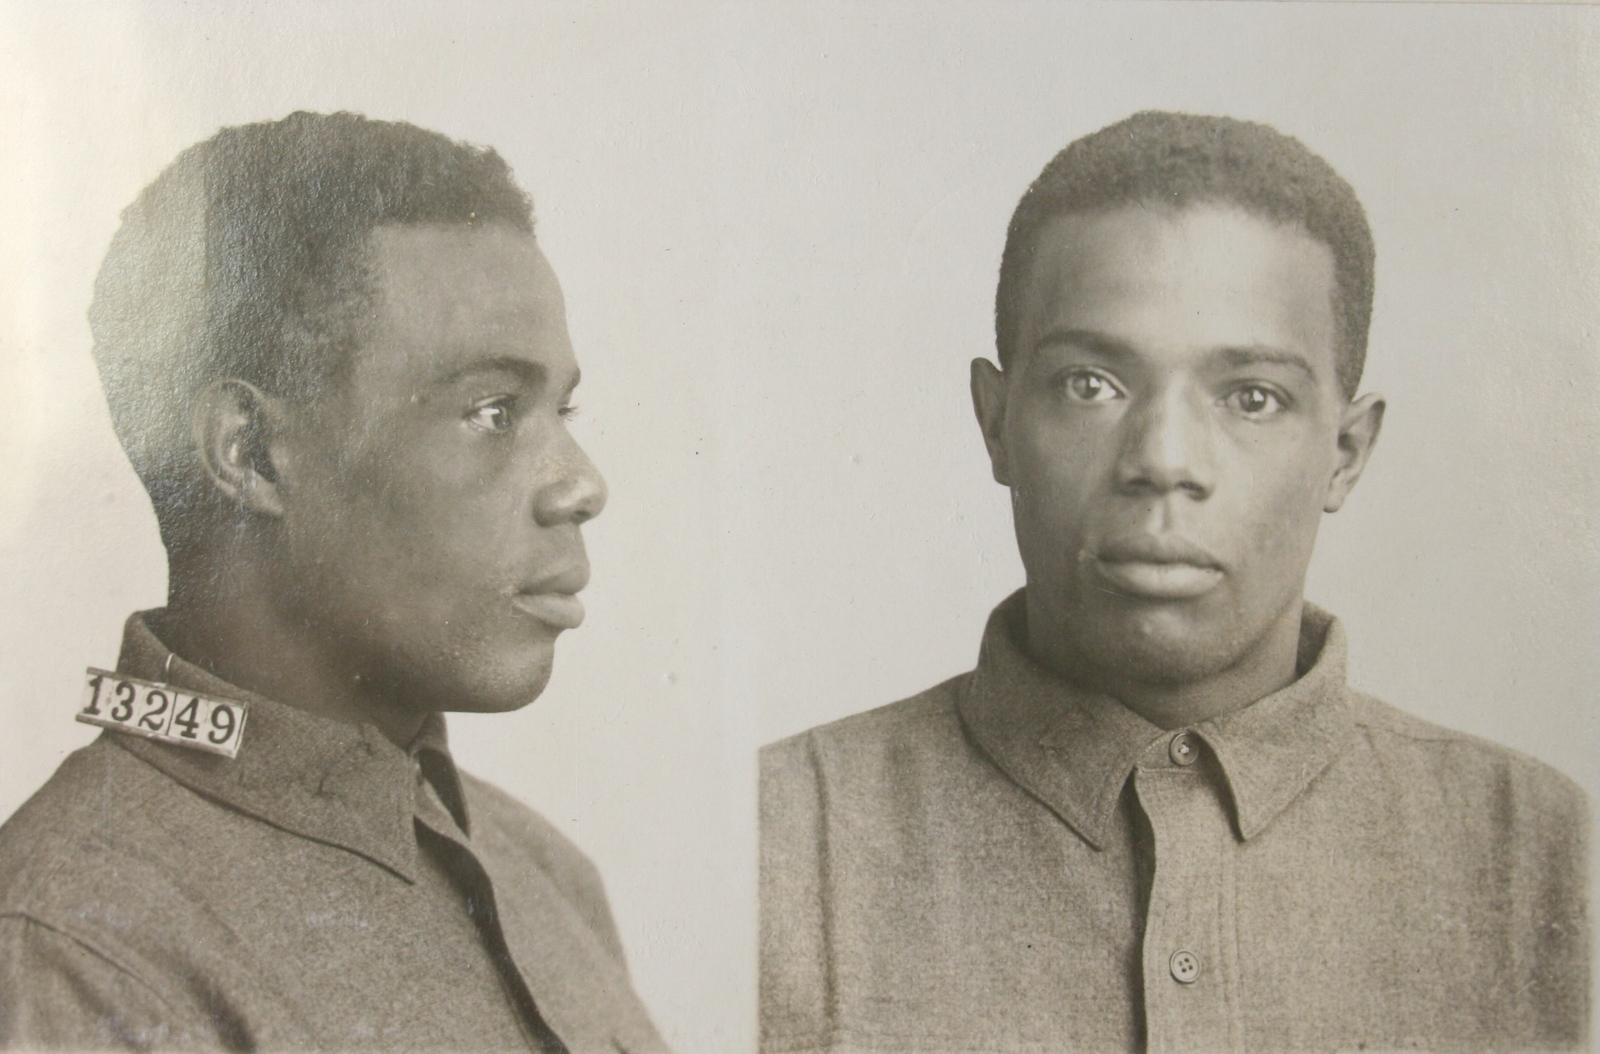 Photograph of William Mance